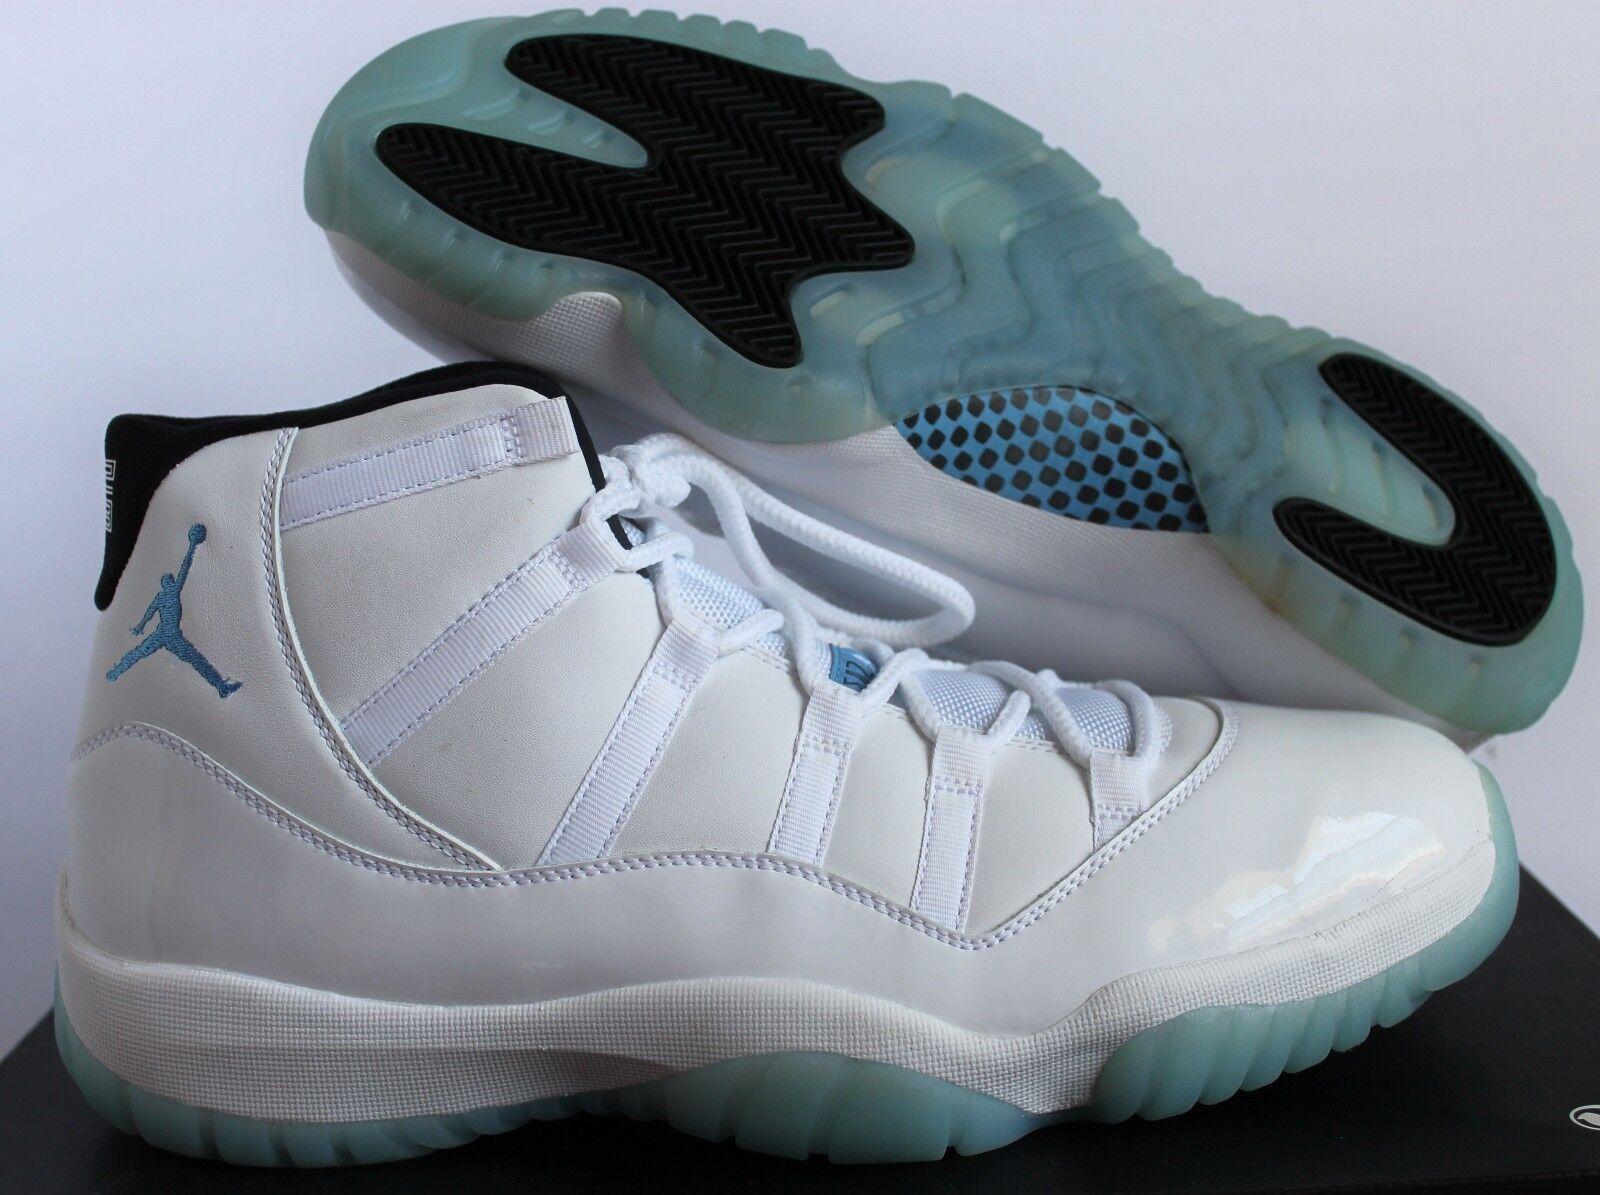 Nike Air Jordan Jordan Jordan 11 Legend bluee Retro XI Columbia White Men's sz 13 [378037-117] 8c5873